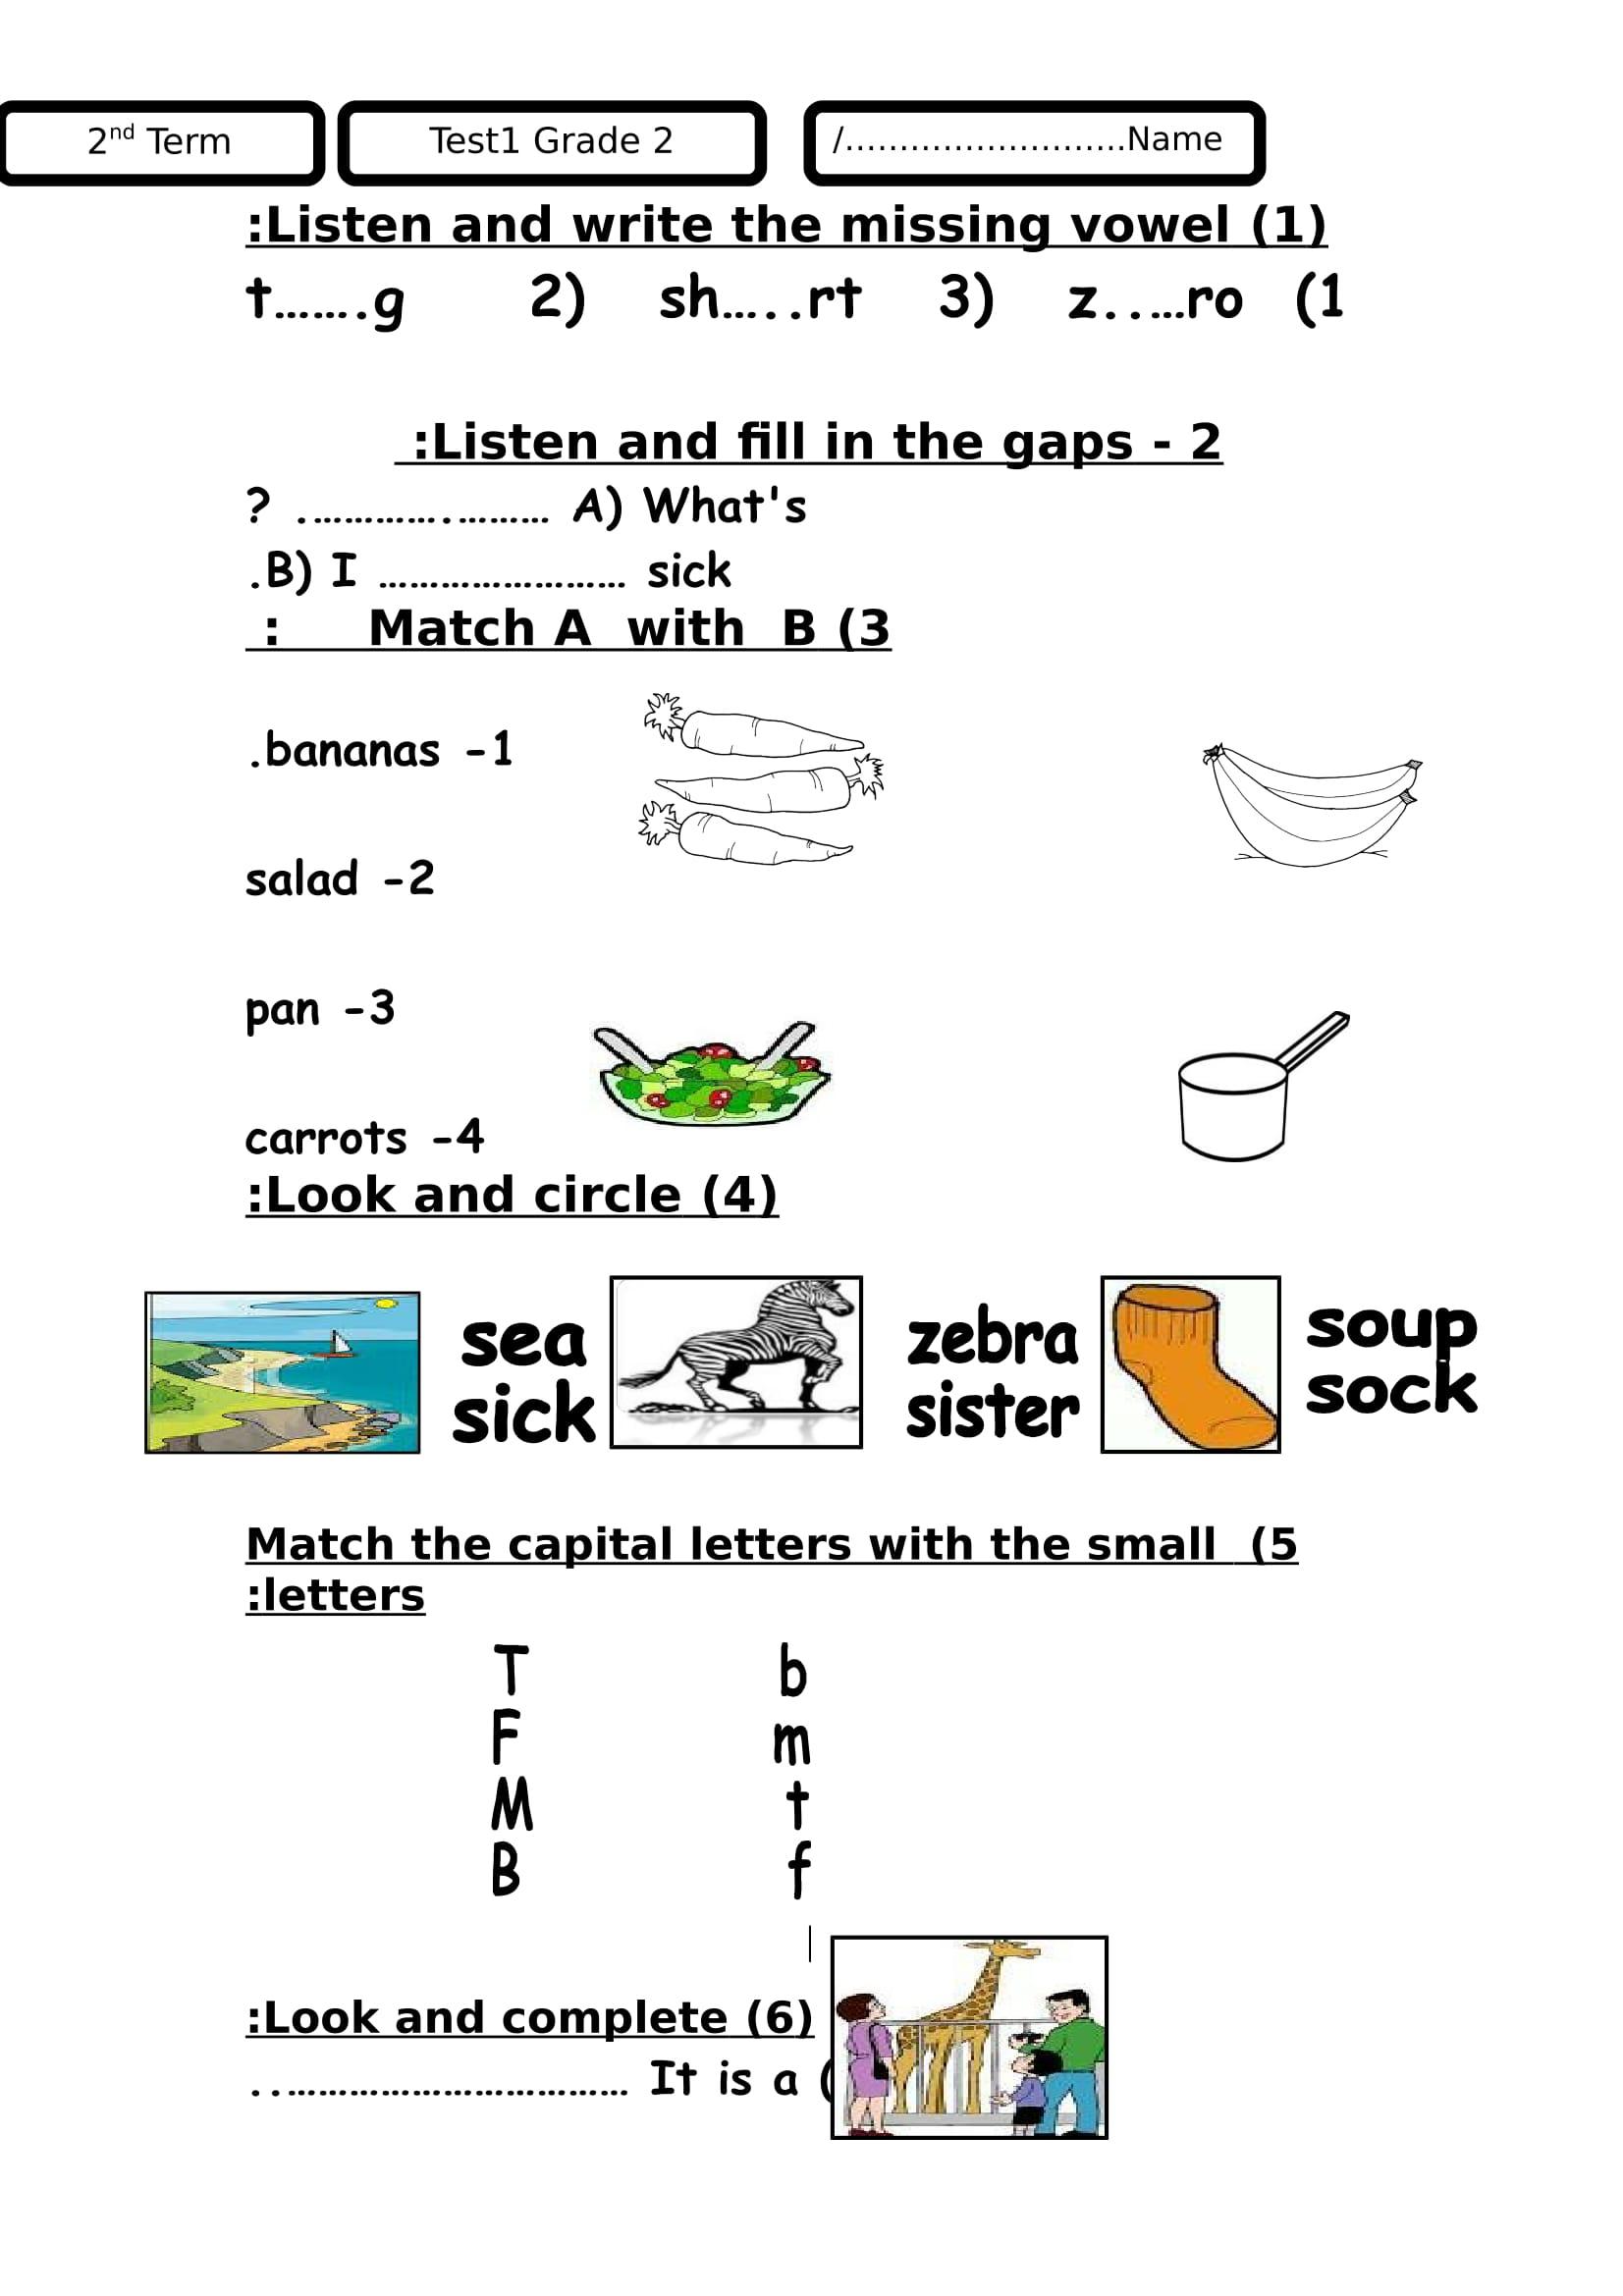 exam-eg.com_1481911029741.jpg